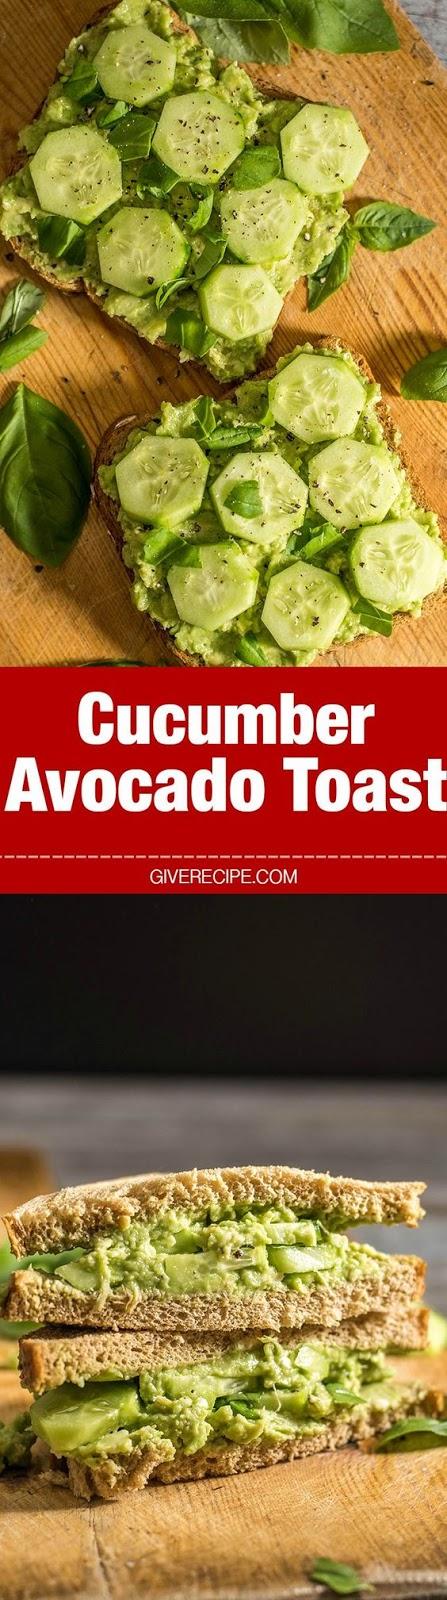 cucumber avocado toast